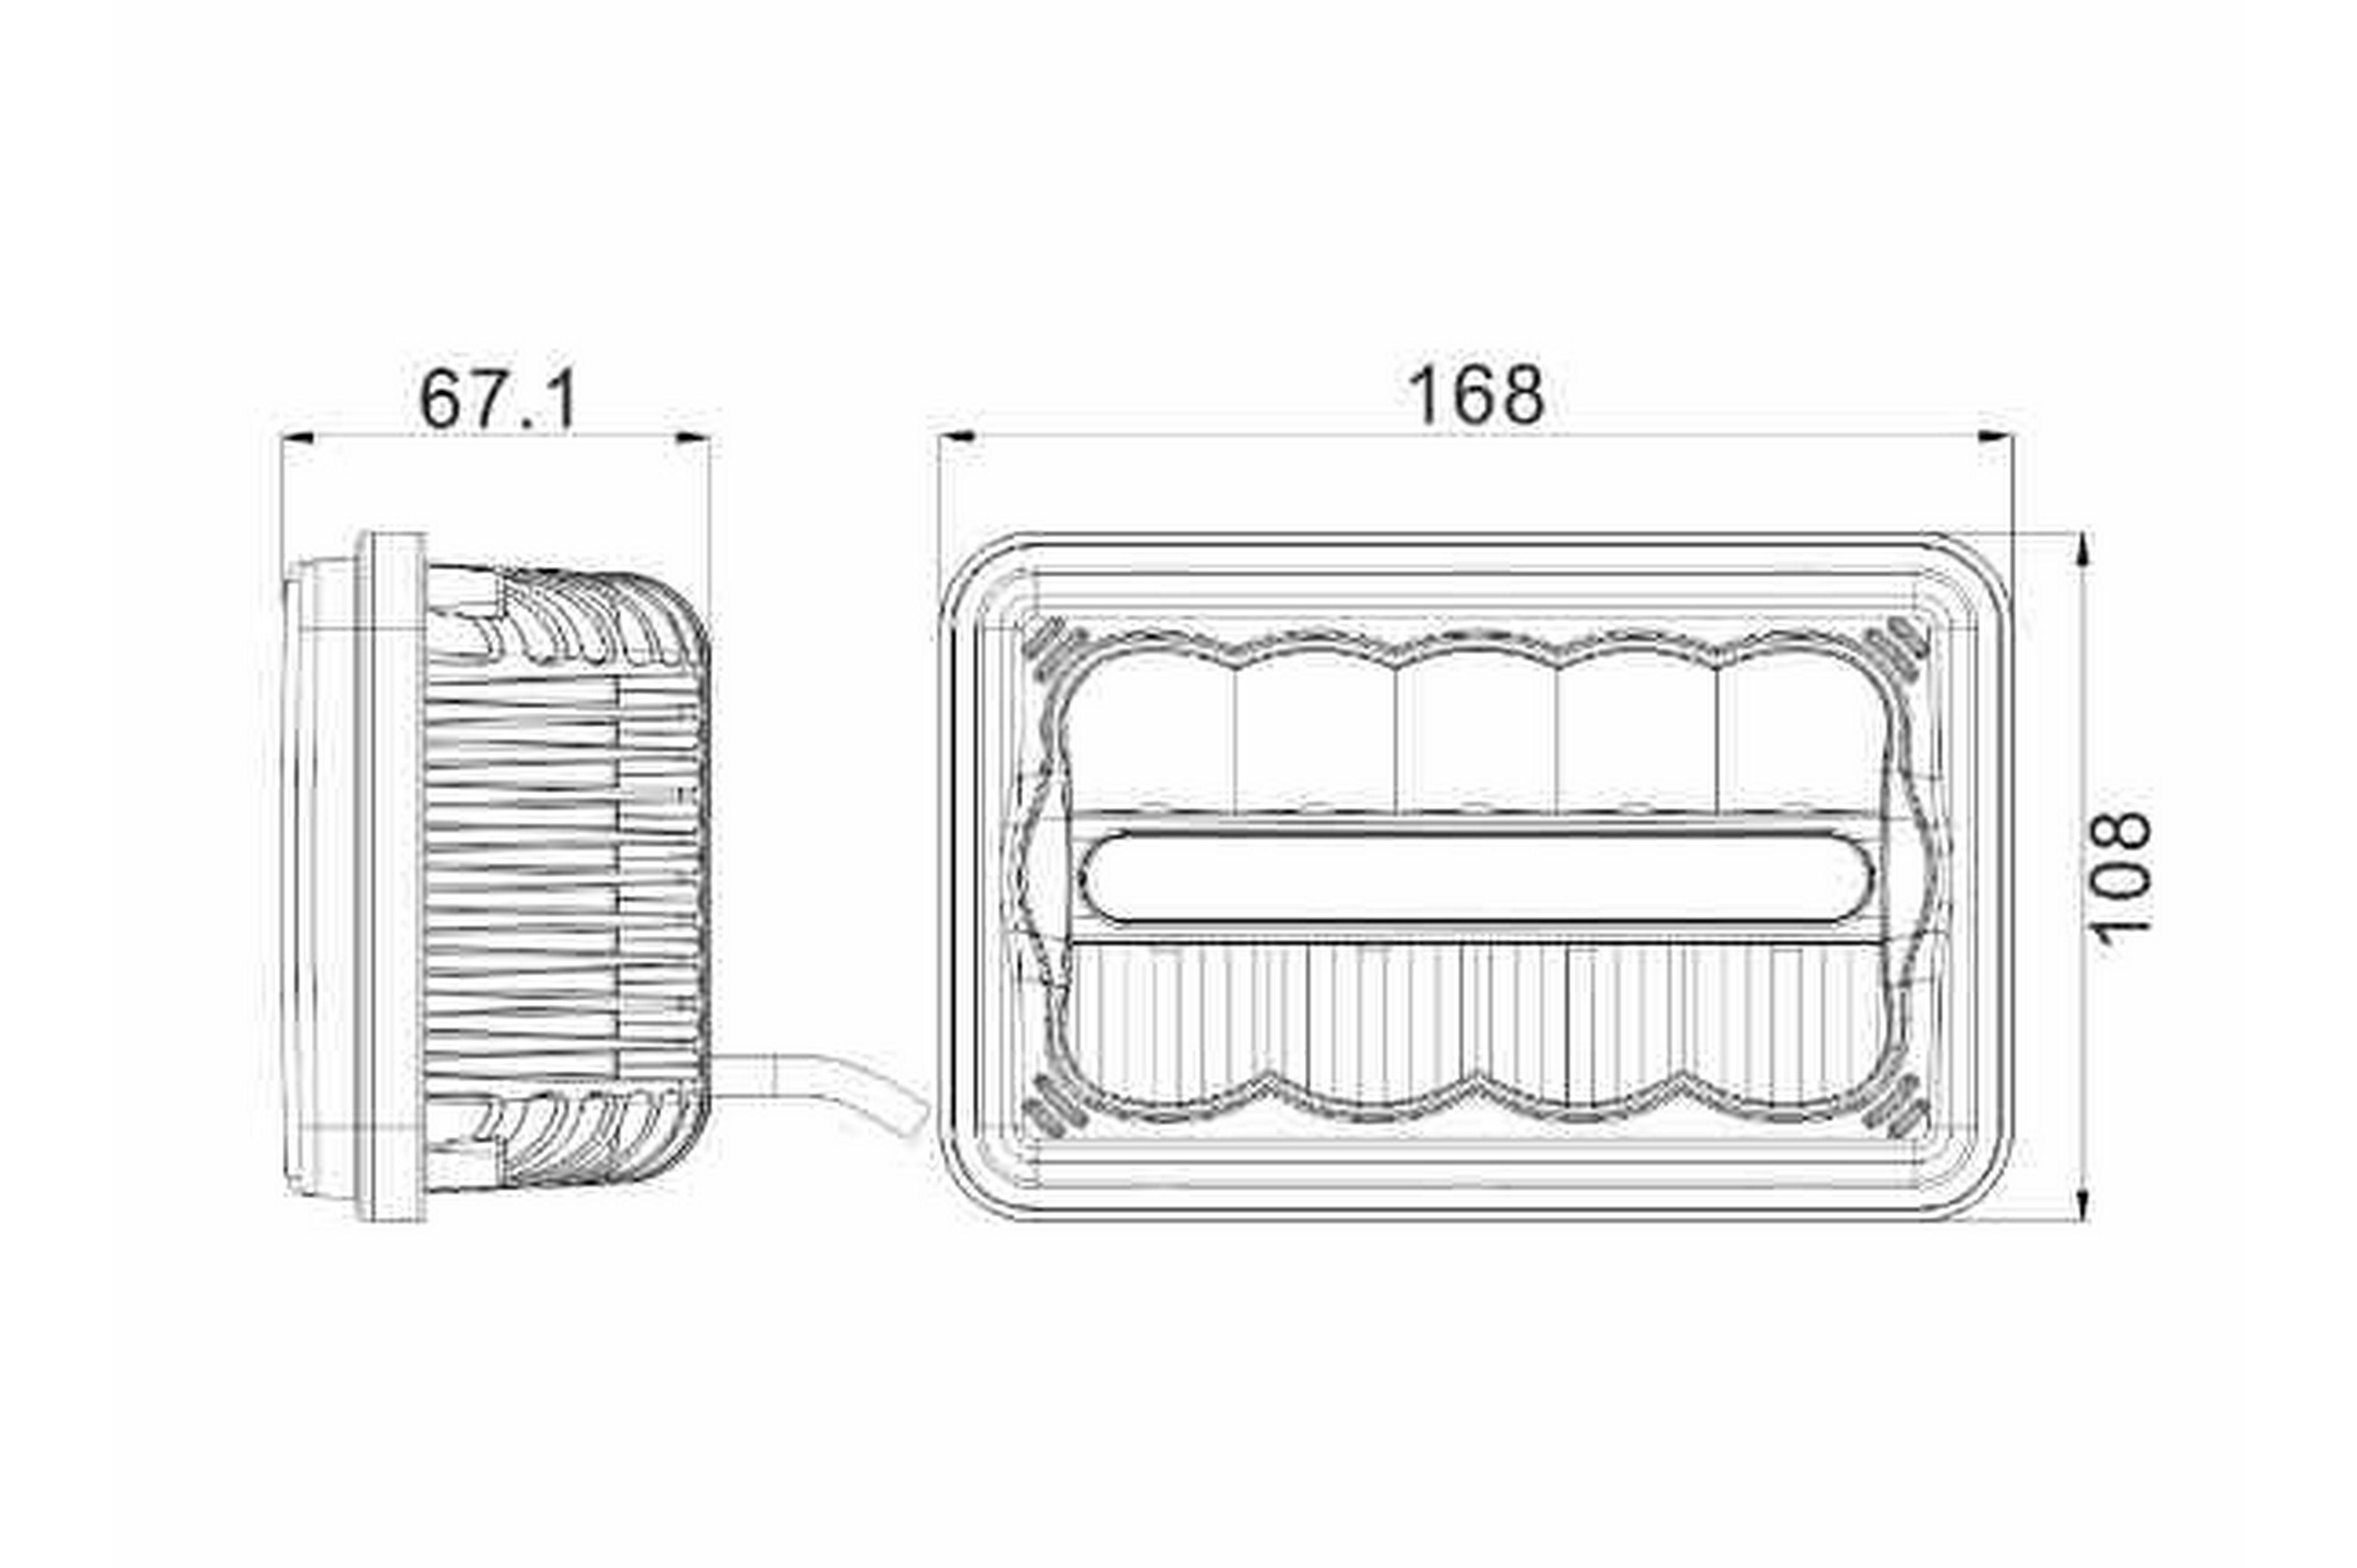 45W 4x6 External LED Headlights - Low/High Beams - 10-30V DC - Chrome  Reflector